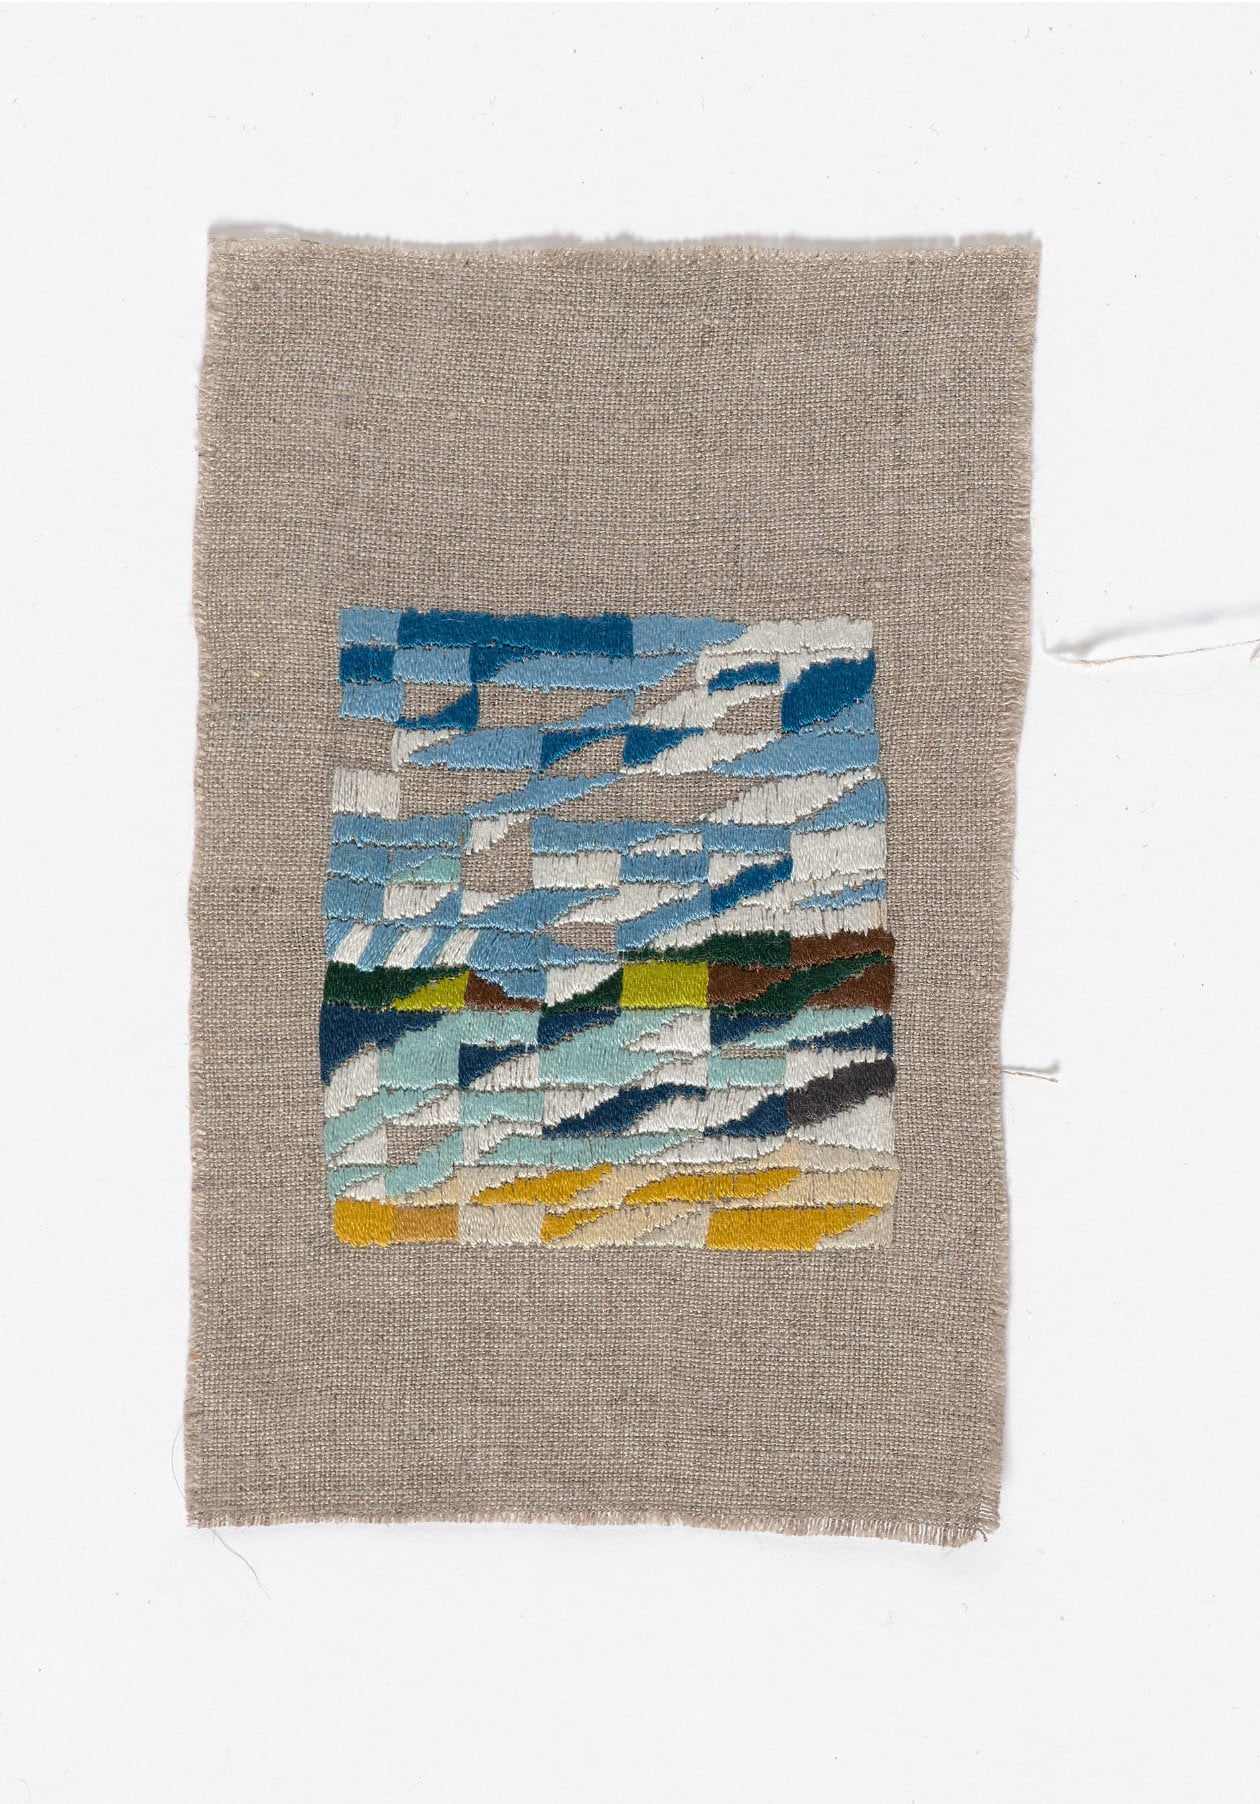 Silverleaves  2014 Cotton thread on linen 15 x 17.5cm